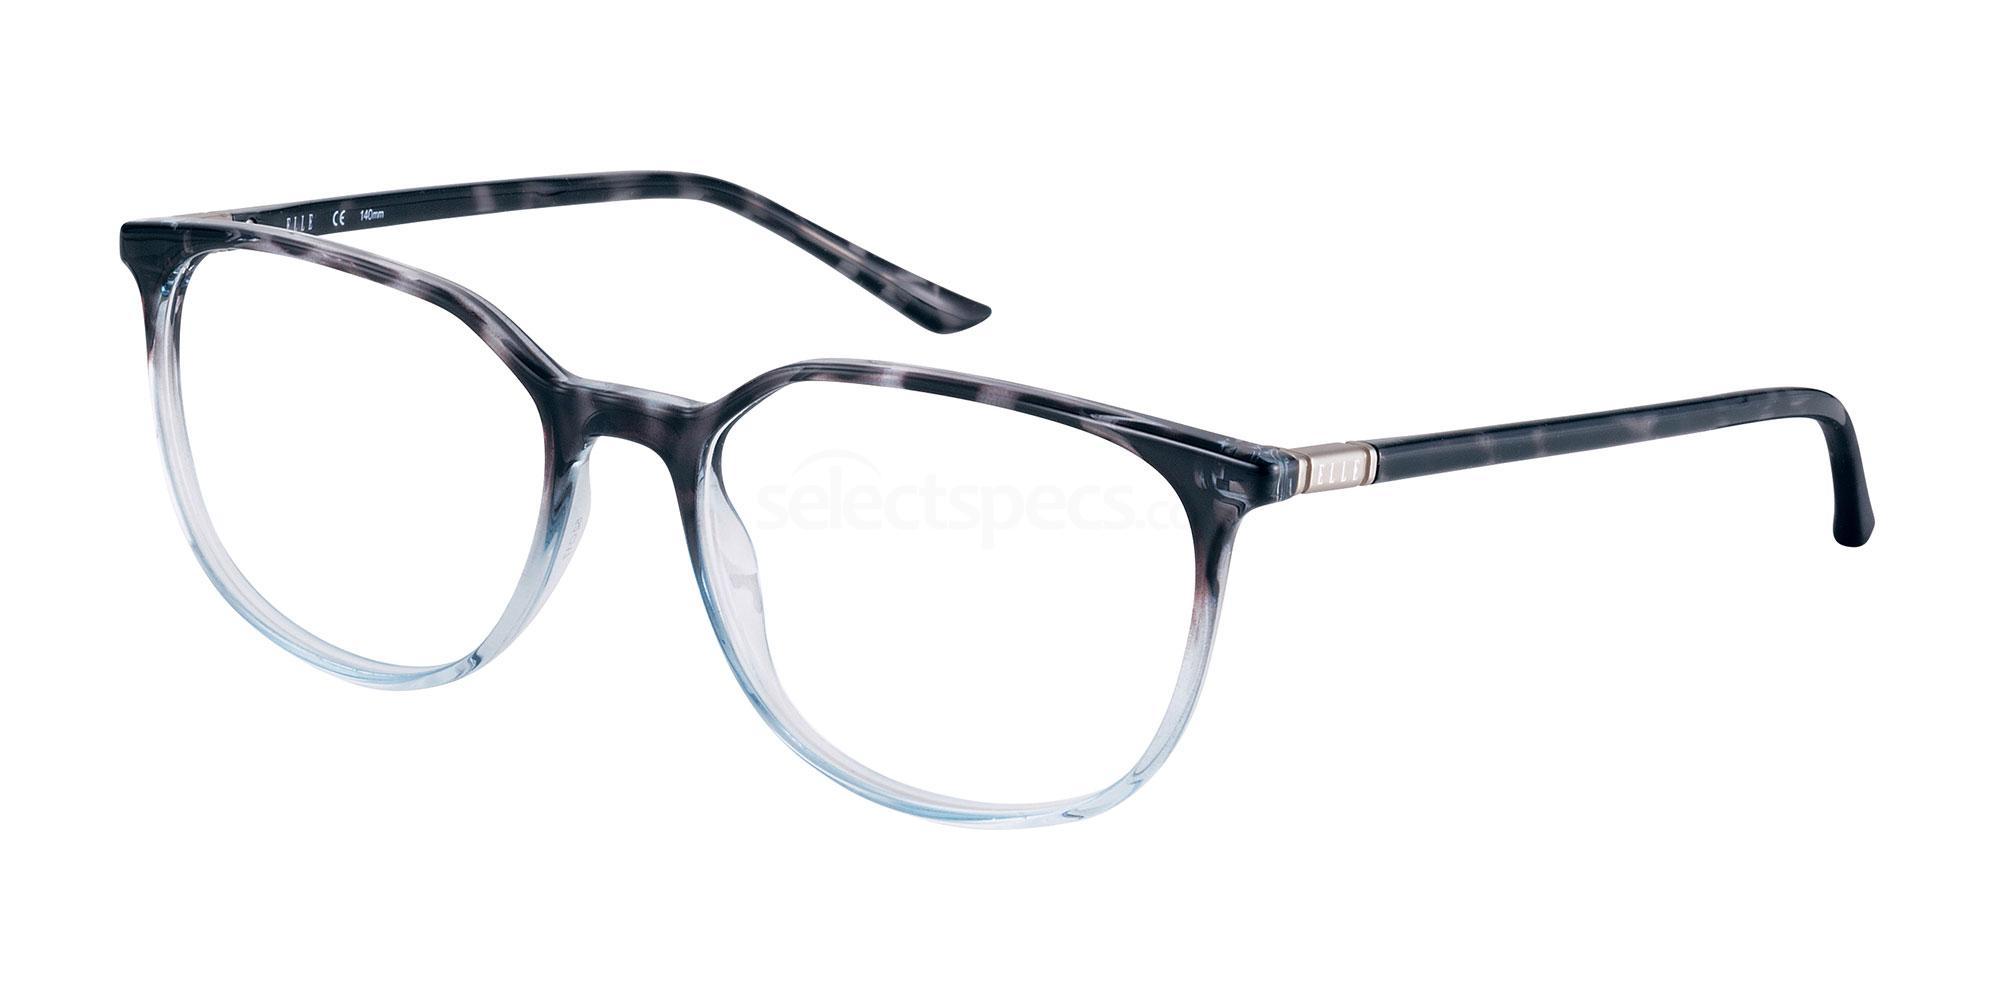 BL EL13485 Glasses, ELLE